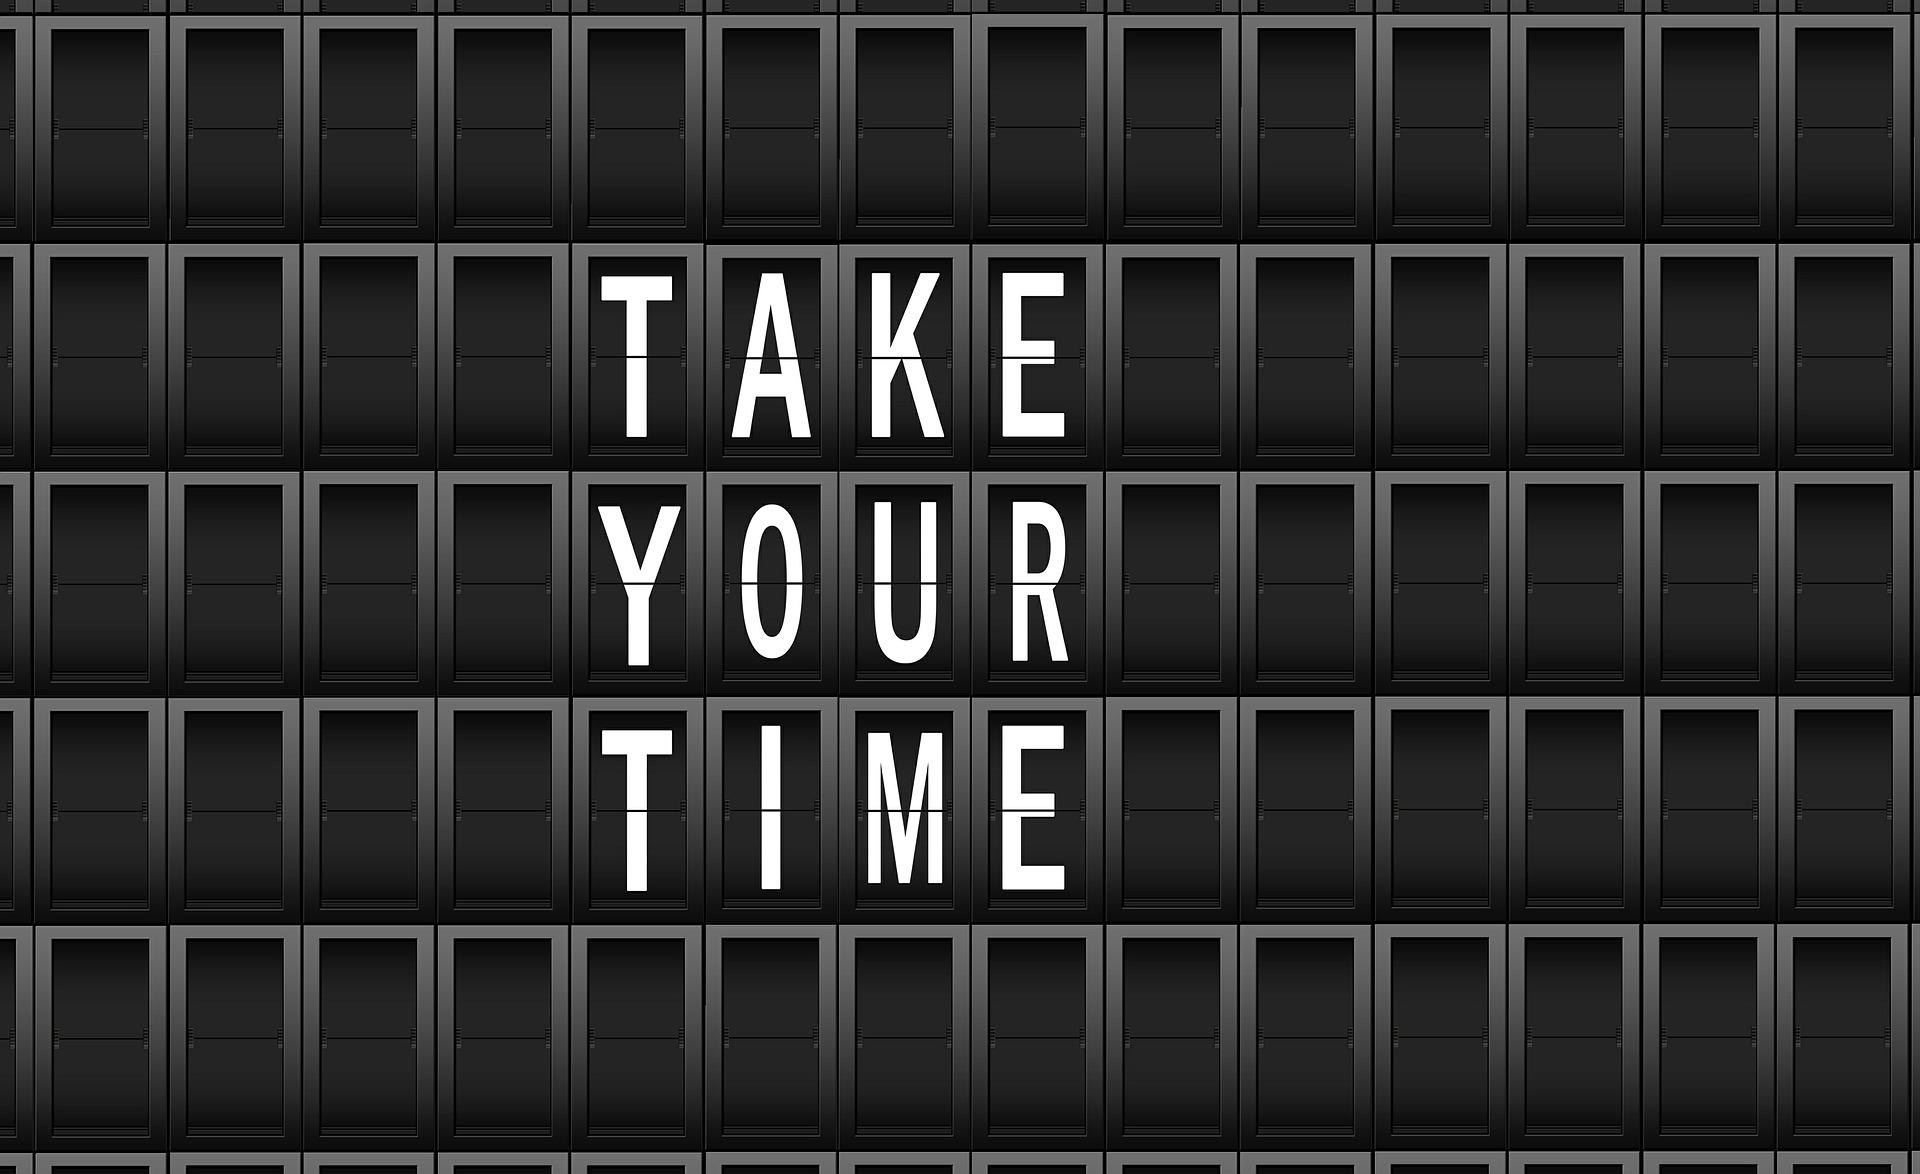 Take your time (tekst)